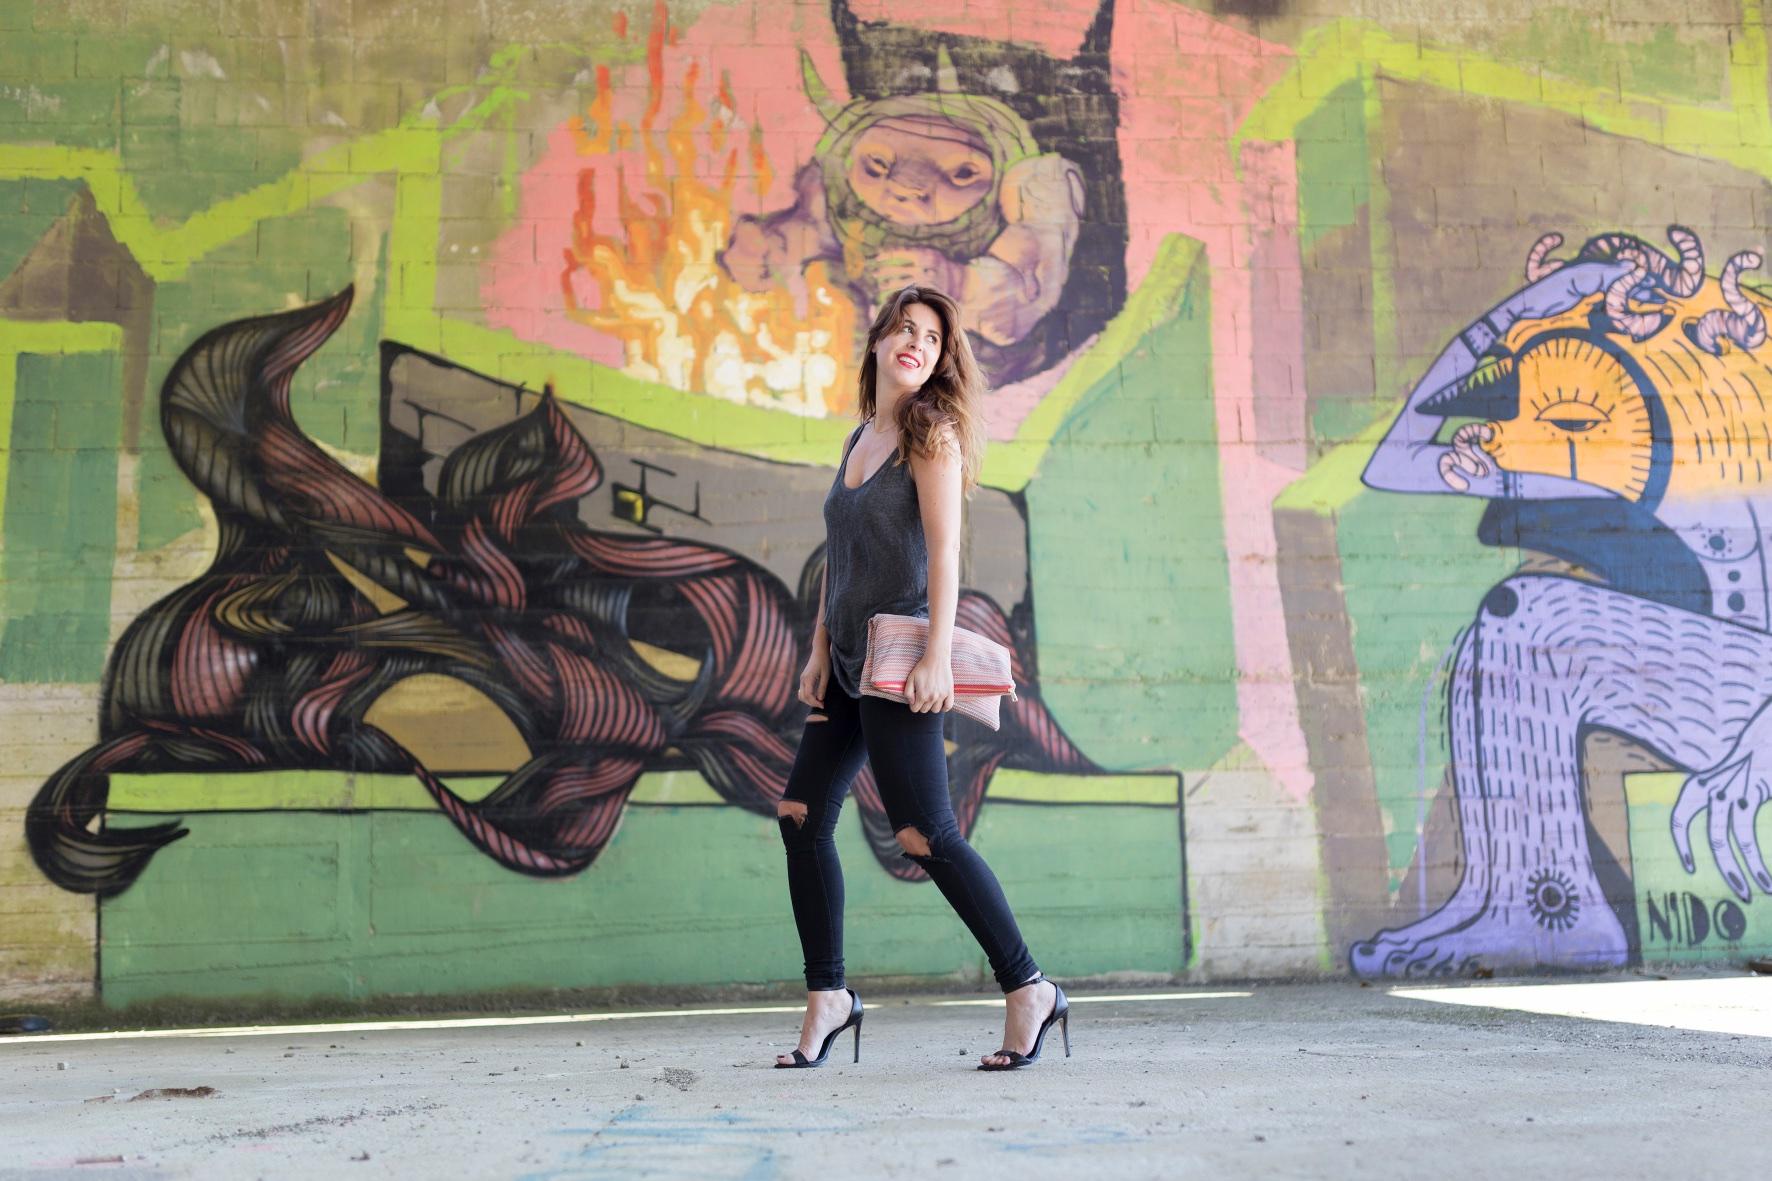 moda-estilo-look-ootd-zara-blogger-descalzaporelparque-EN LAS NUBES BOLSOS-Divina Comedia-streetstyle-fashion